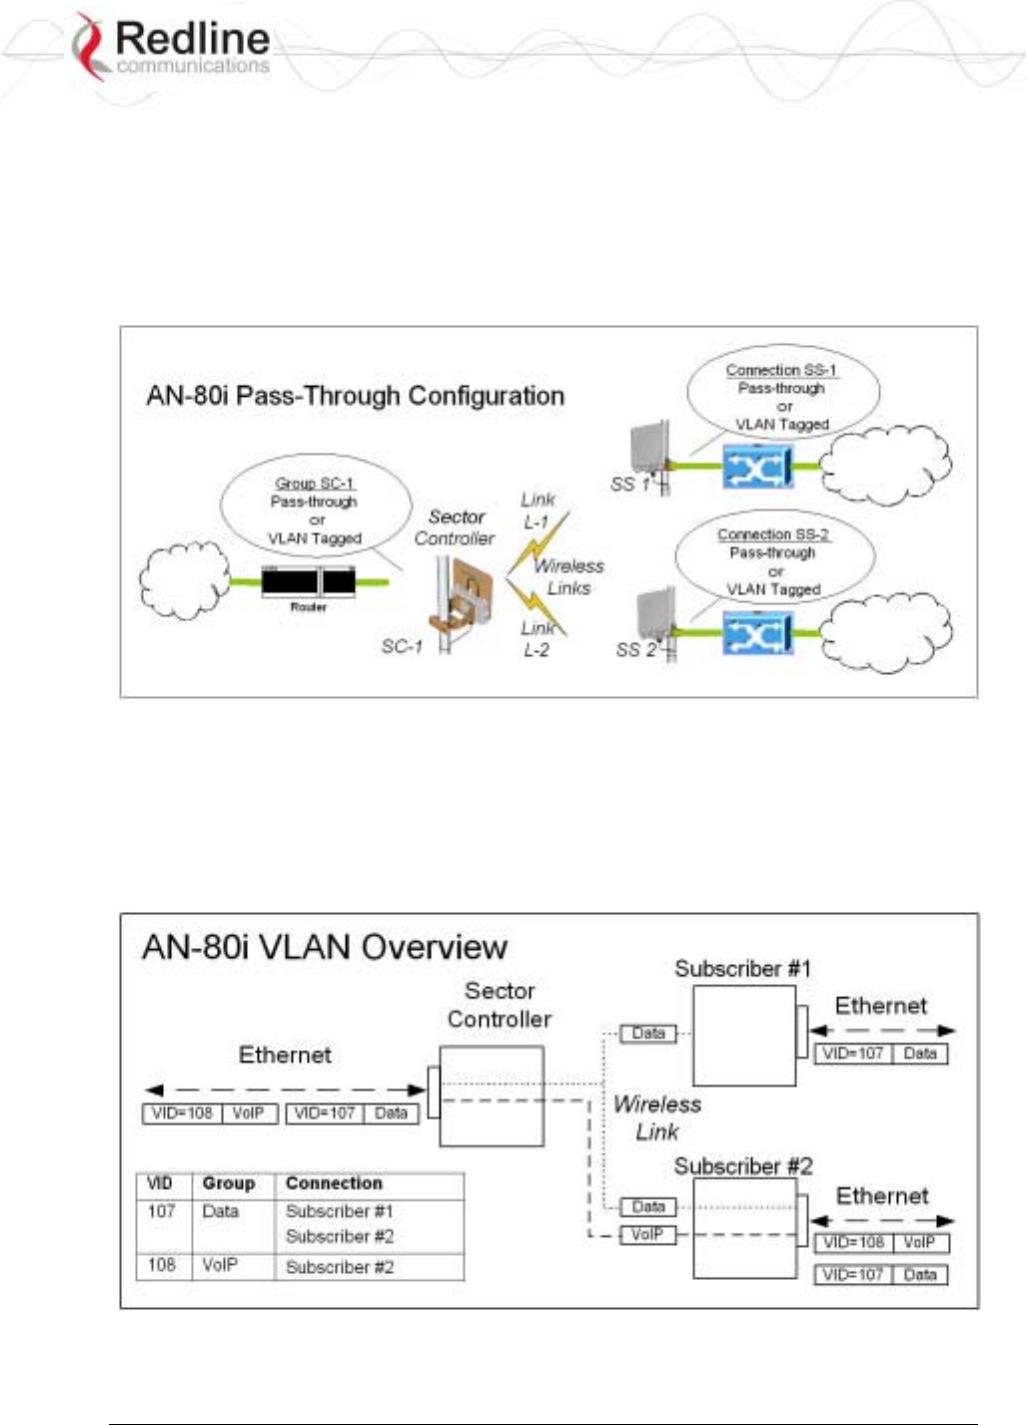 Redline Communications AN80I BROADBAND WIRELESS SYSTEM User